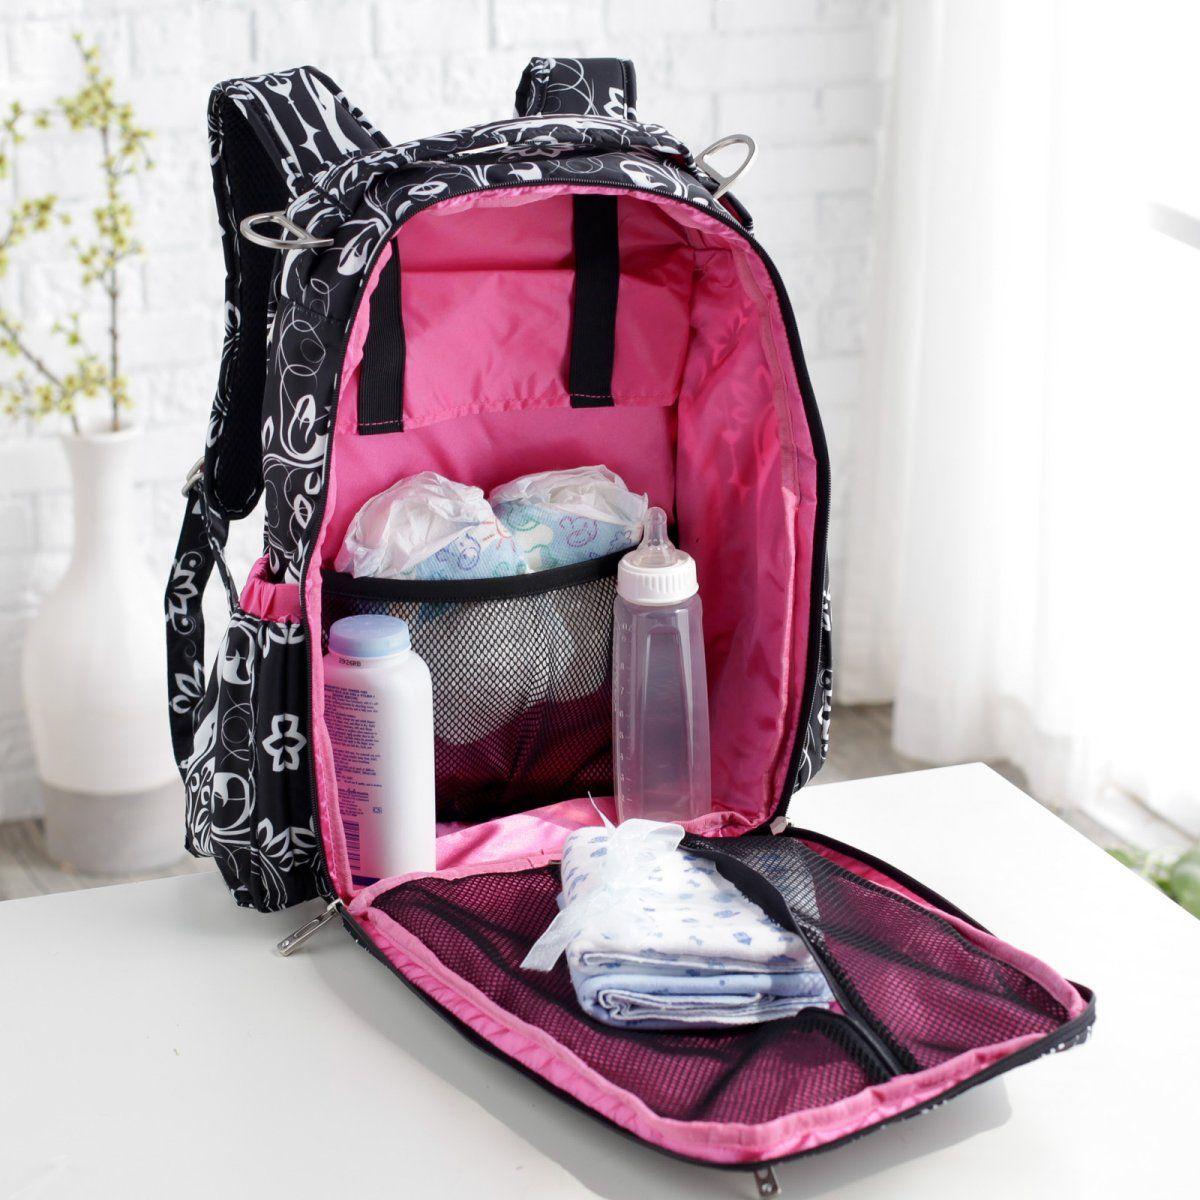 Coach Baby Backpack Diaper Bag - CEAGESP 97c2ec4952